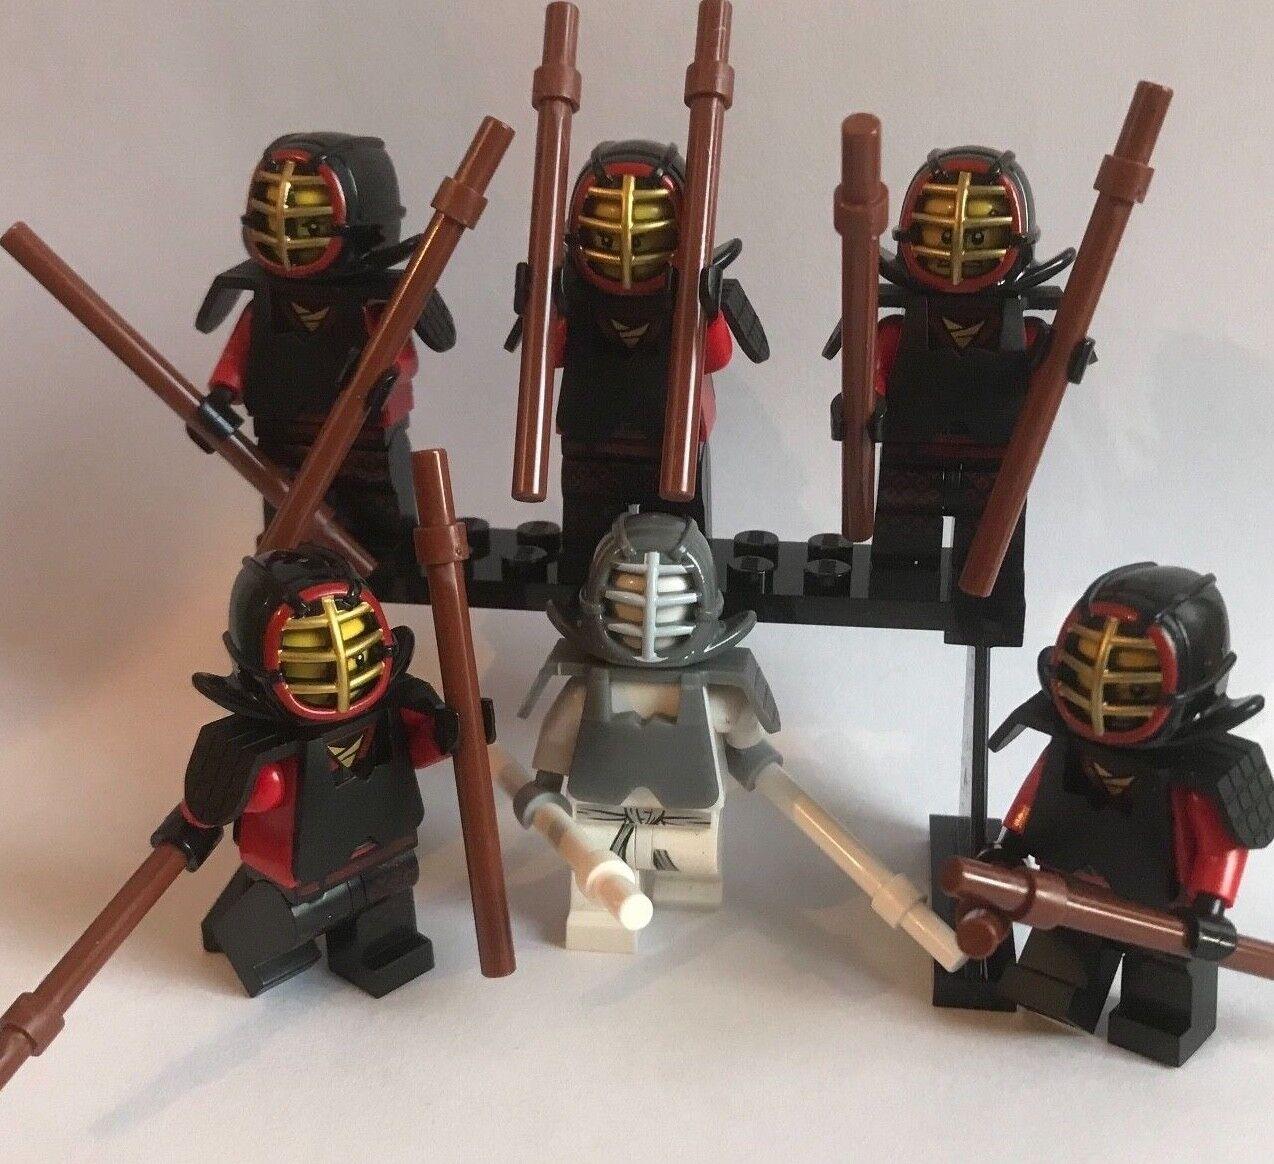 6 KENDO ninja WARRIORS - LEGO Mini Figures - The Ninjago Movie - fighters army